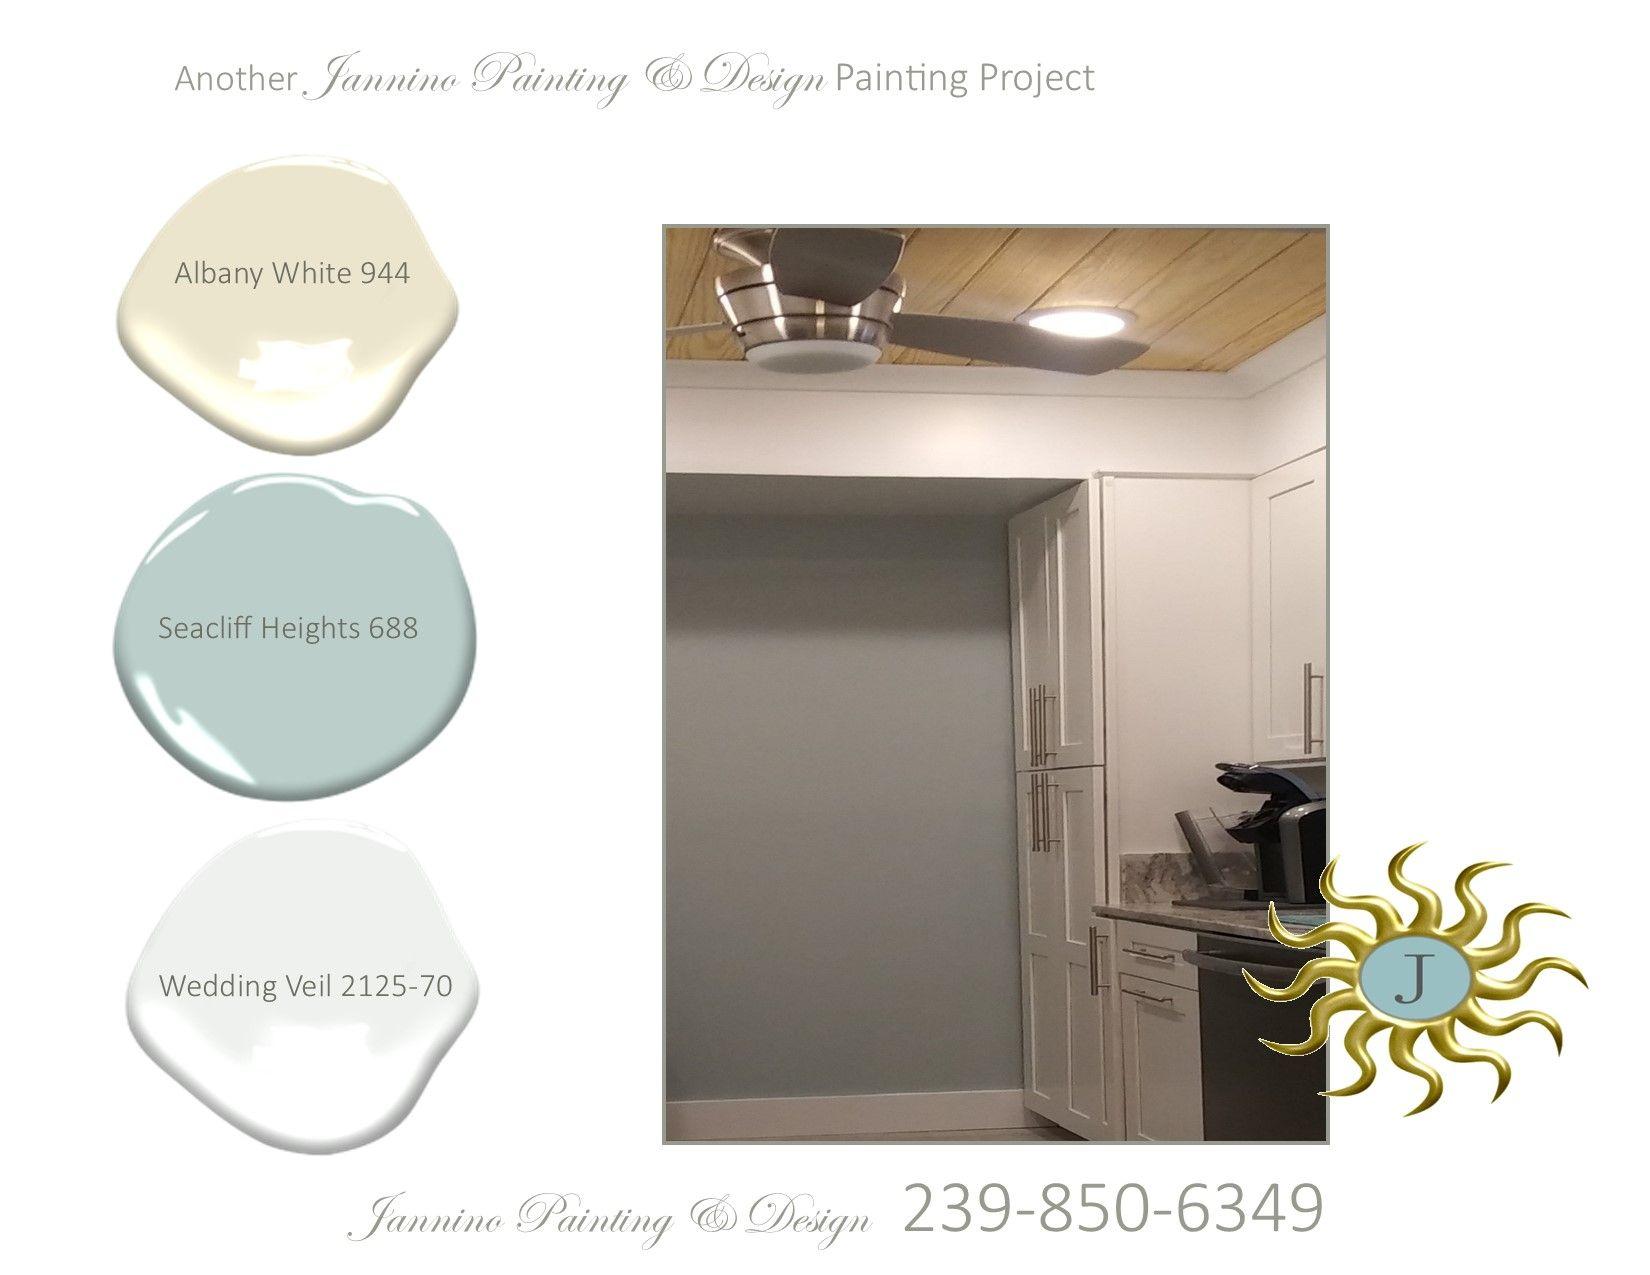 Naples Painter Jannino Painting Design Choses Colors For Client S Cooler Kind Of Beachy Kitchen Paint Designs Design Accent Wall Colors